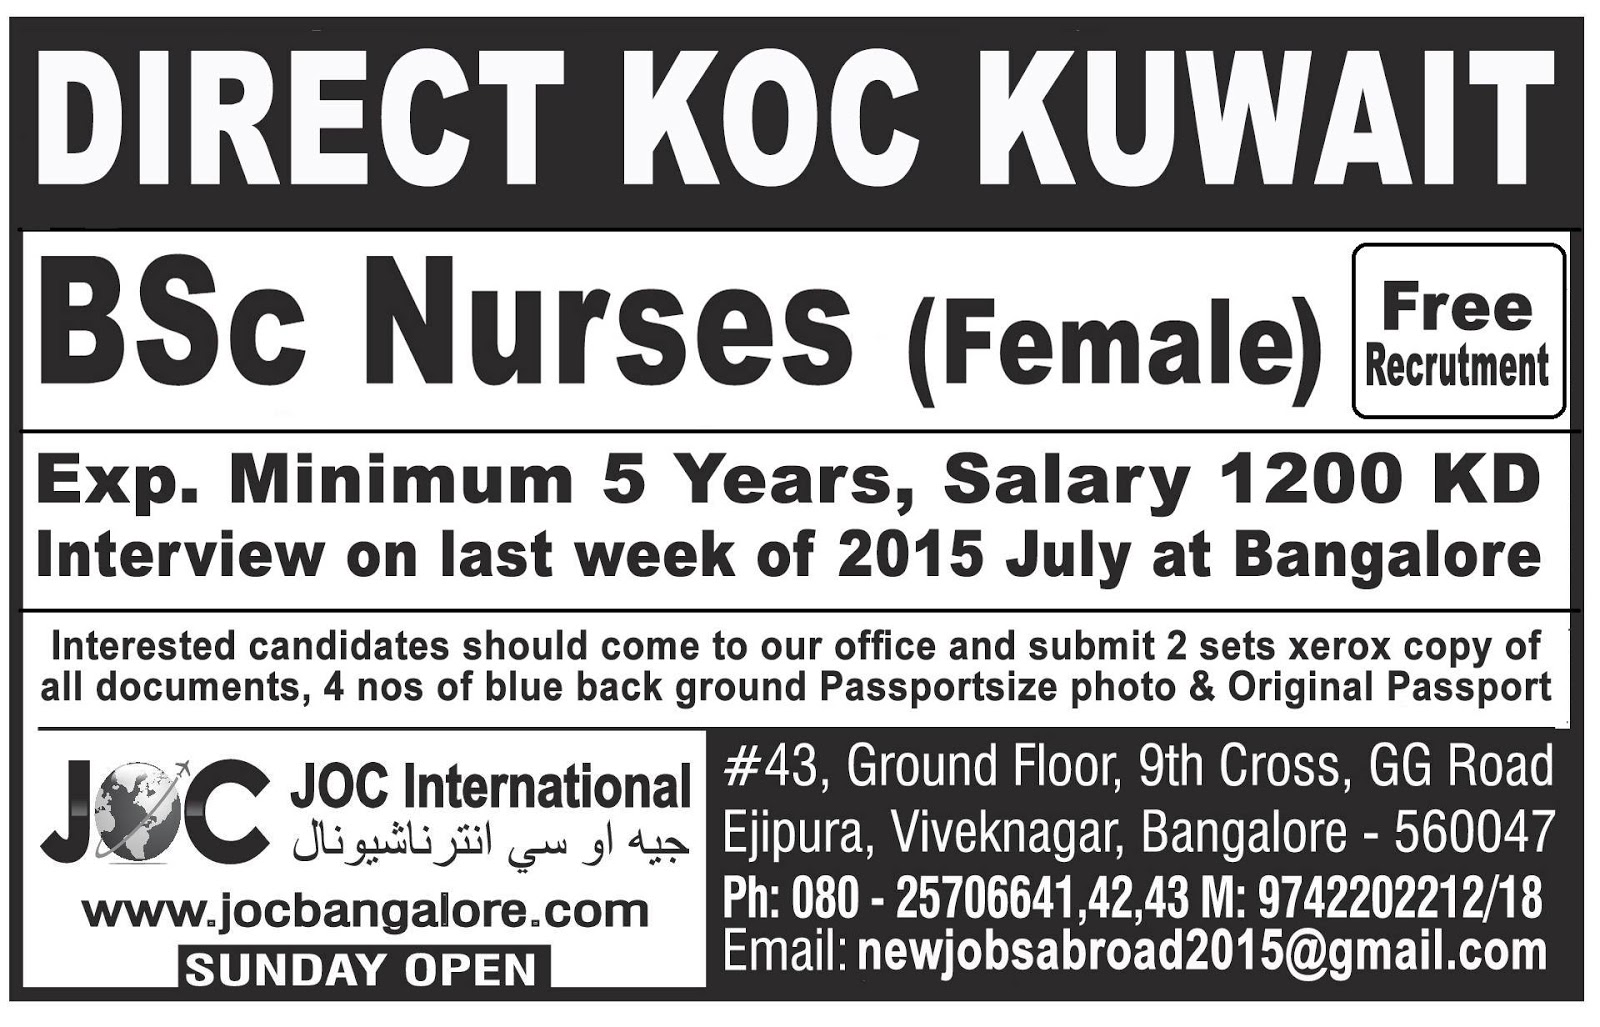 JOC International - KOC Recruitment - Interview in July 2015